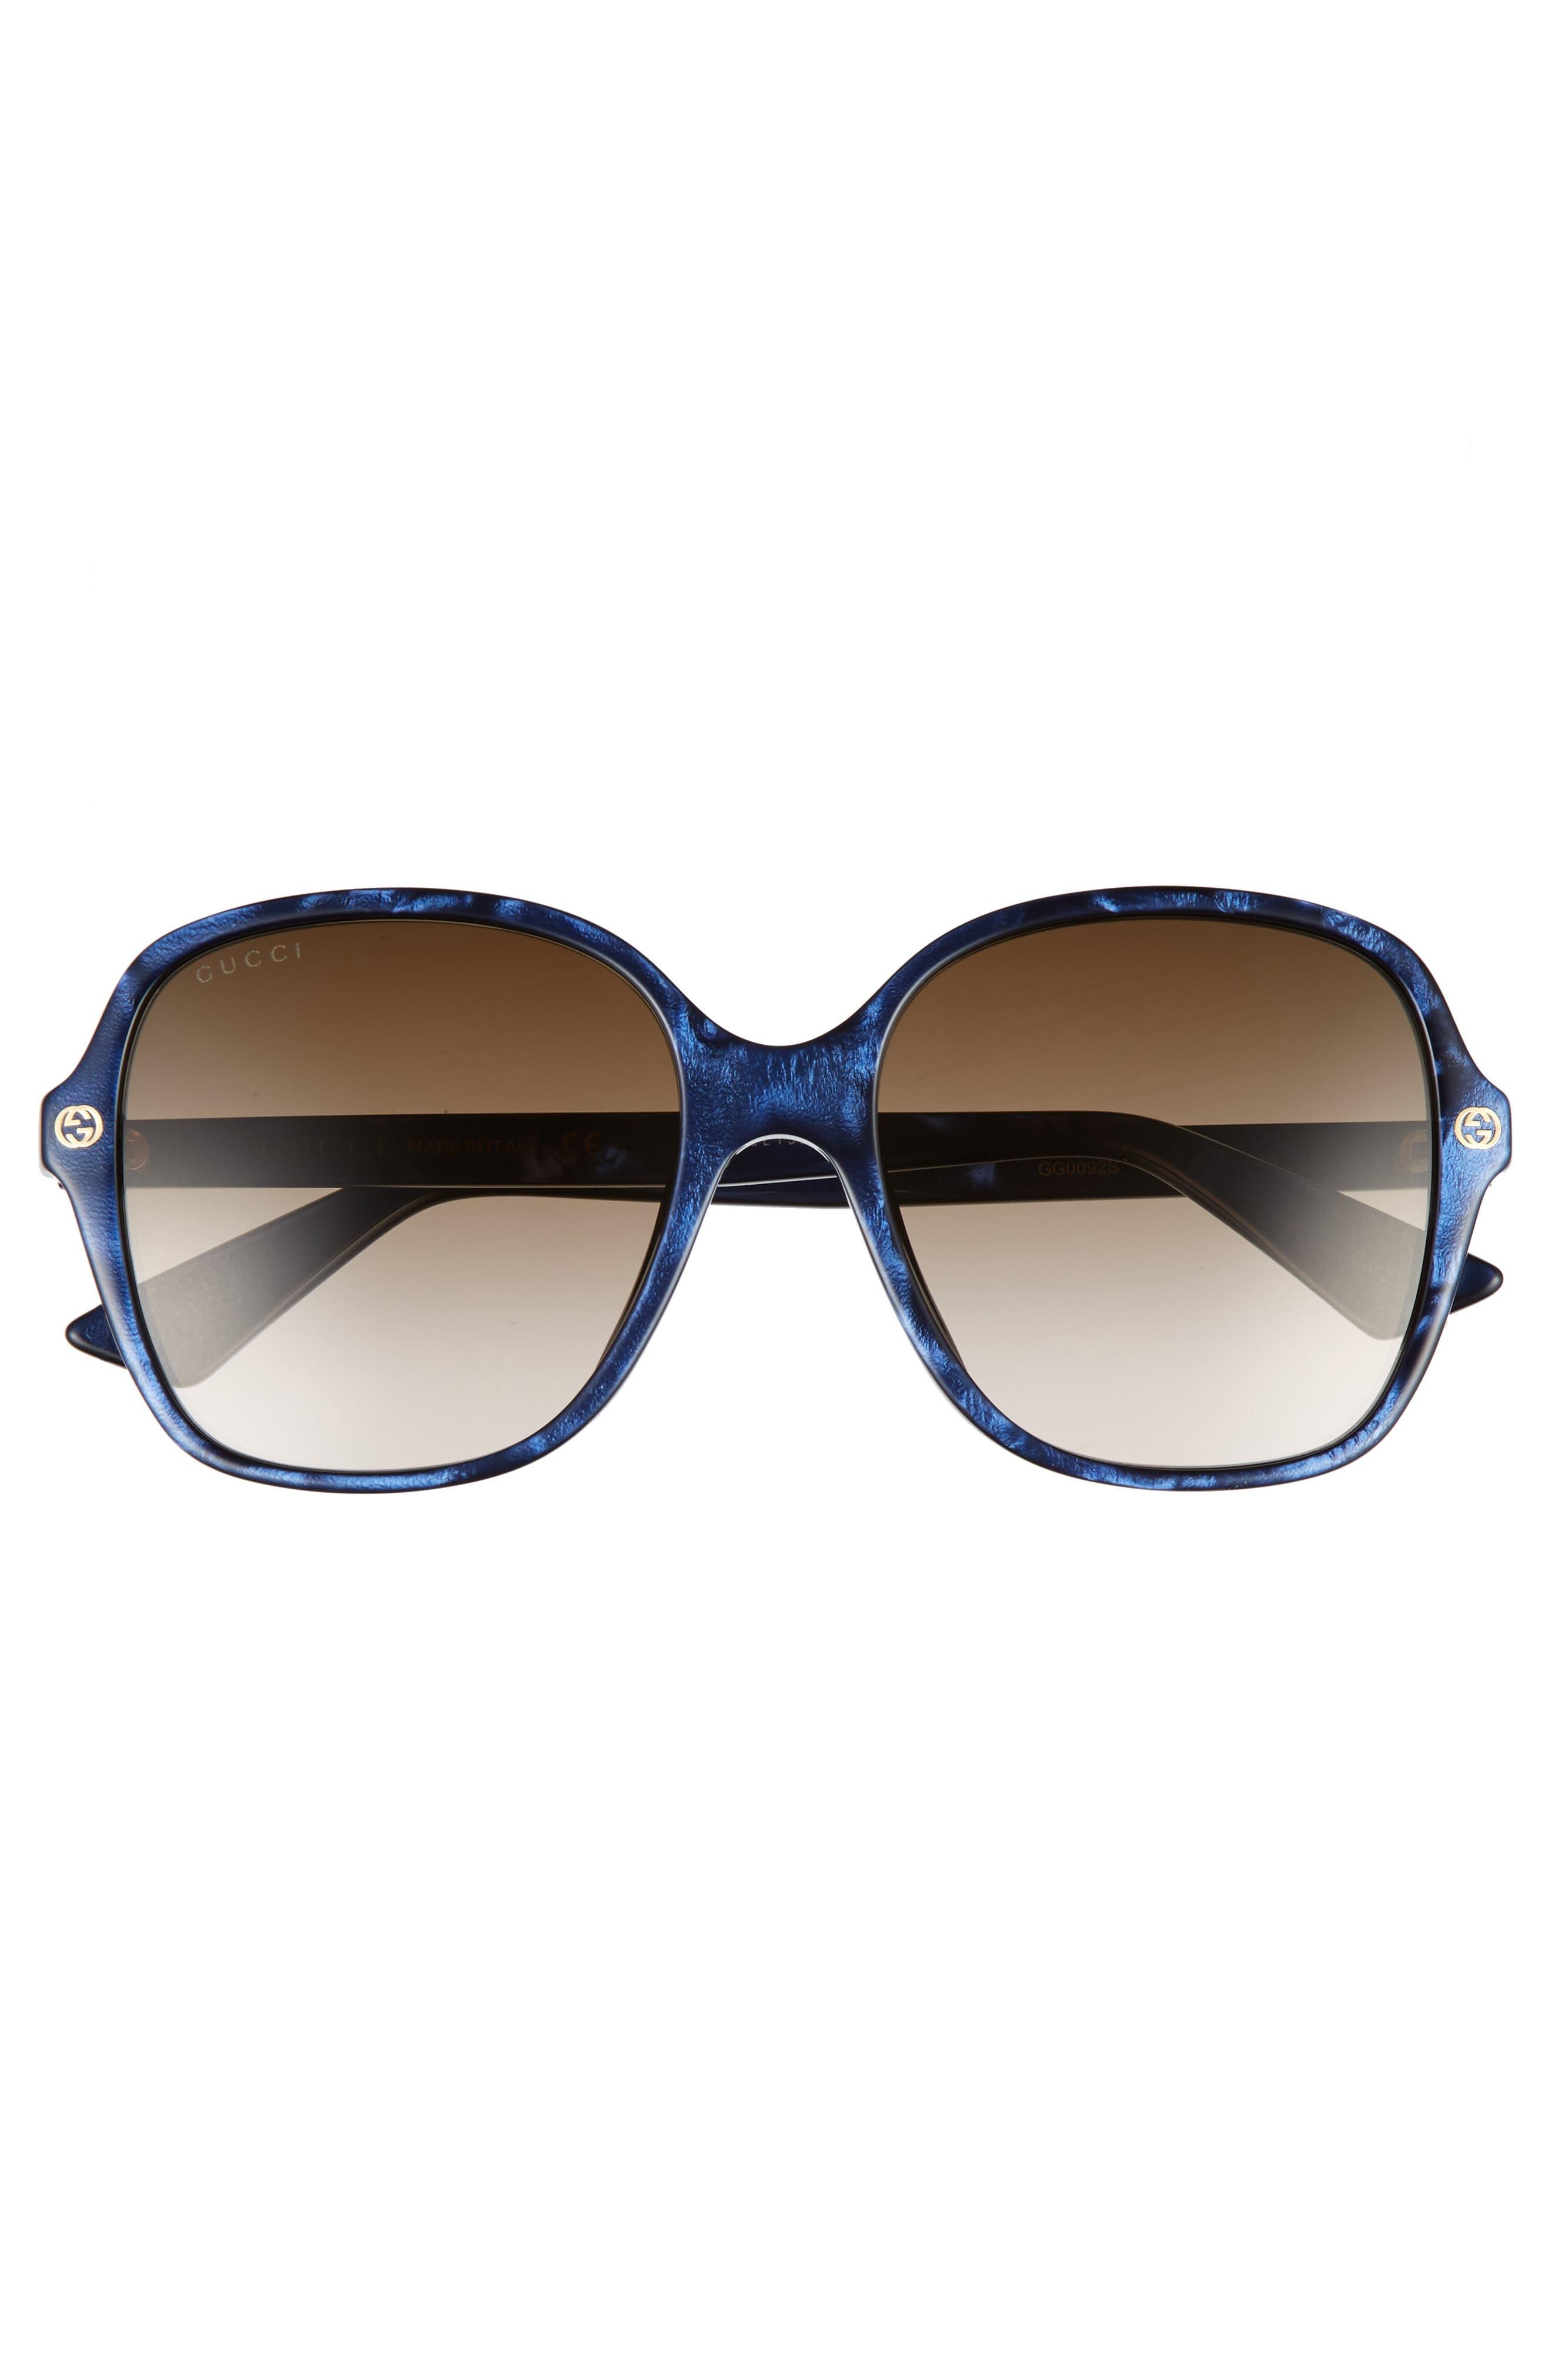 55mm Gradient Sunglasses,                             Alternate thumbnail 3, color,                             Blue/ Brown